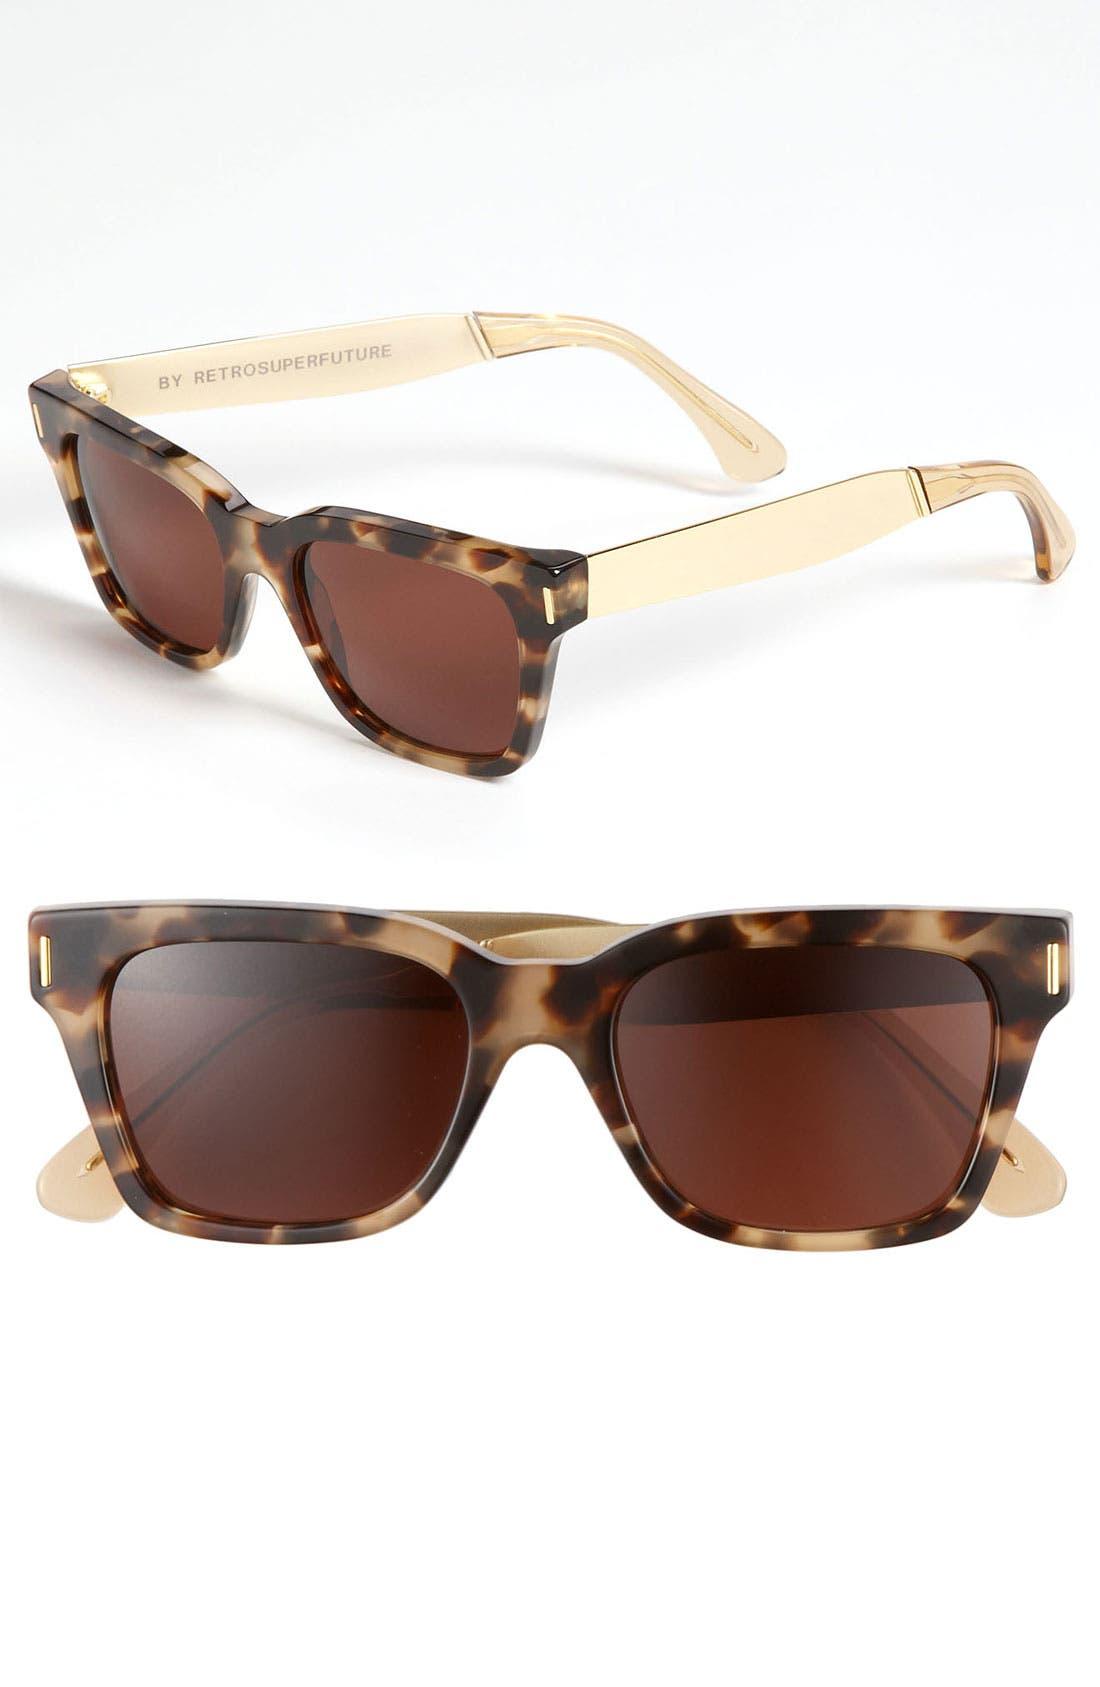 Main Image - SUPER by RETROSUPERFUTURE® 'America' Sunglasses